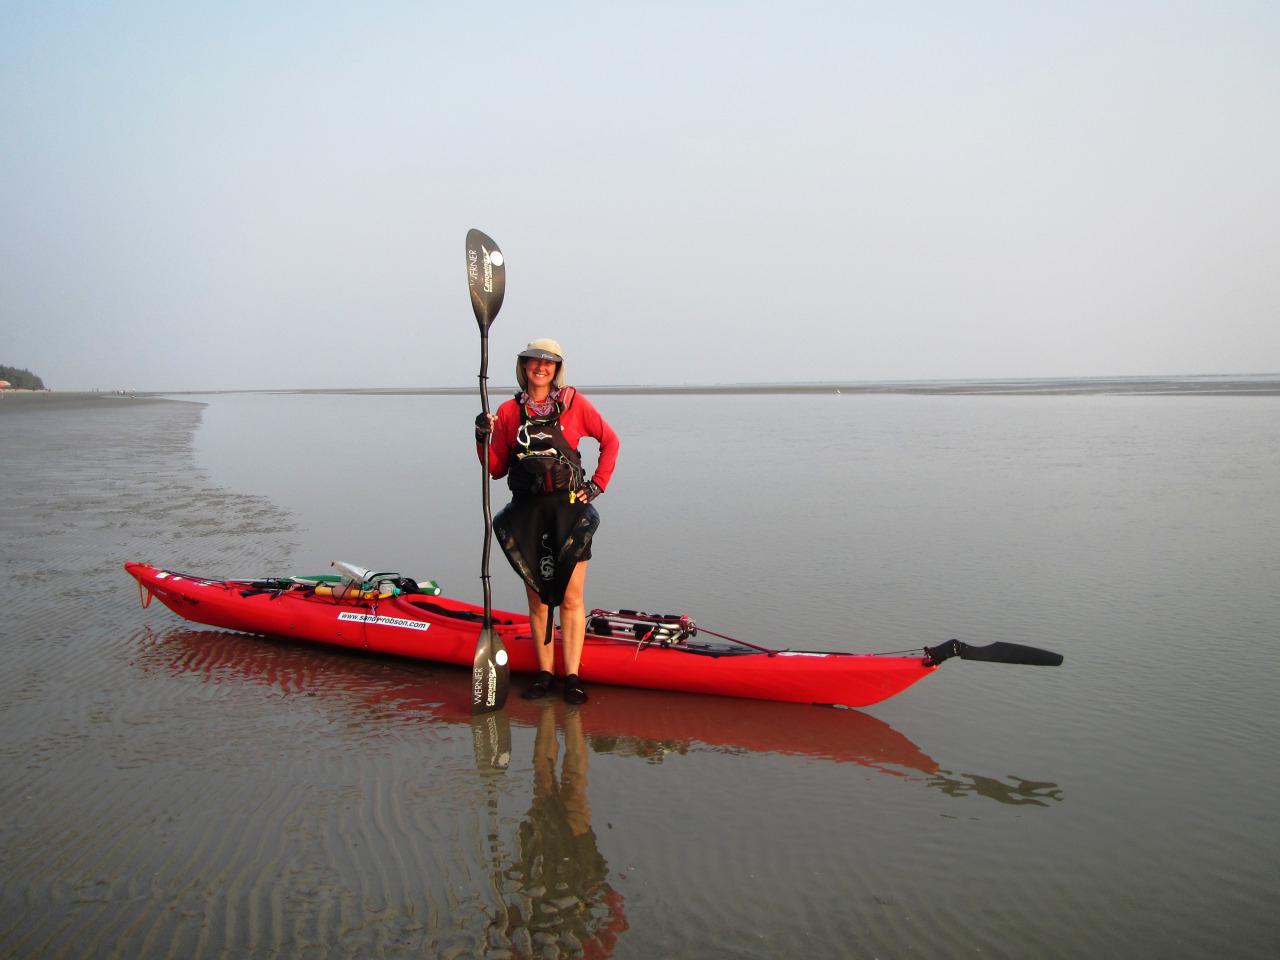 sandy robson canoe kayak australia nominee sportswoman year world paddle awards